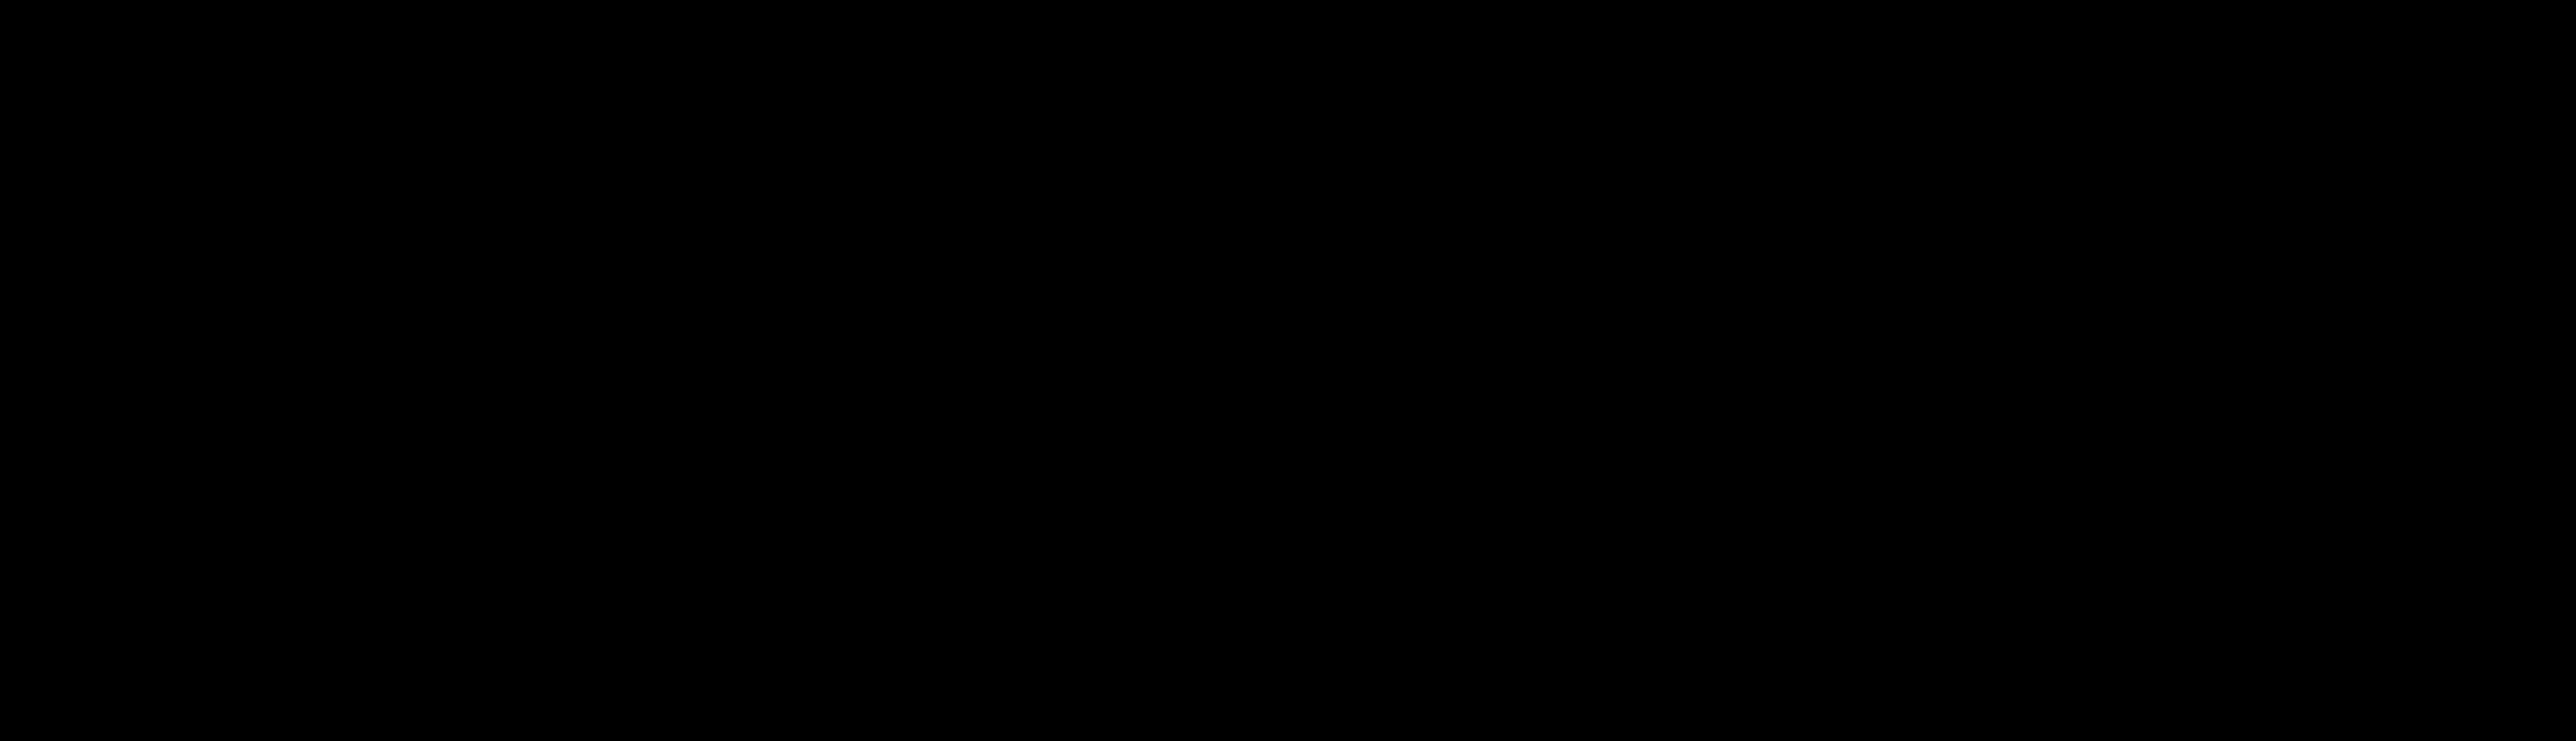 Kaféyine dada